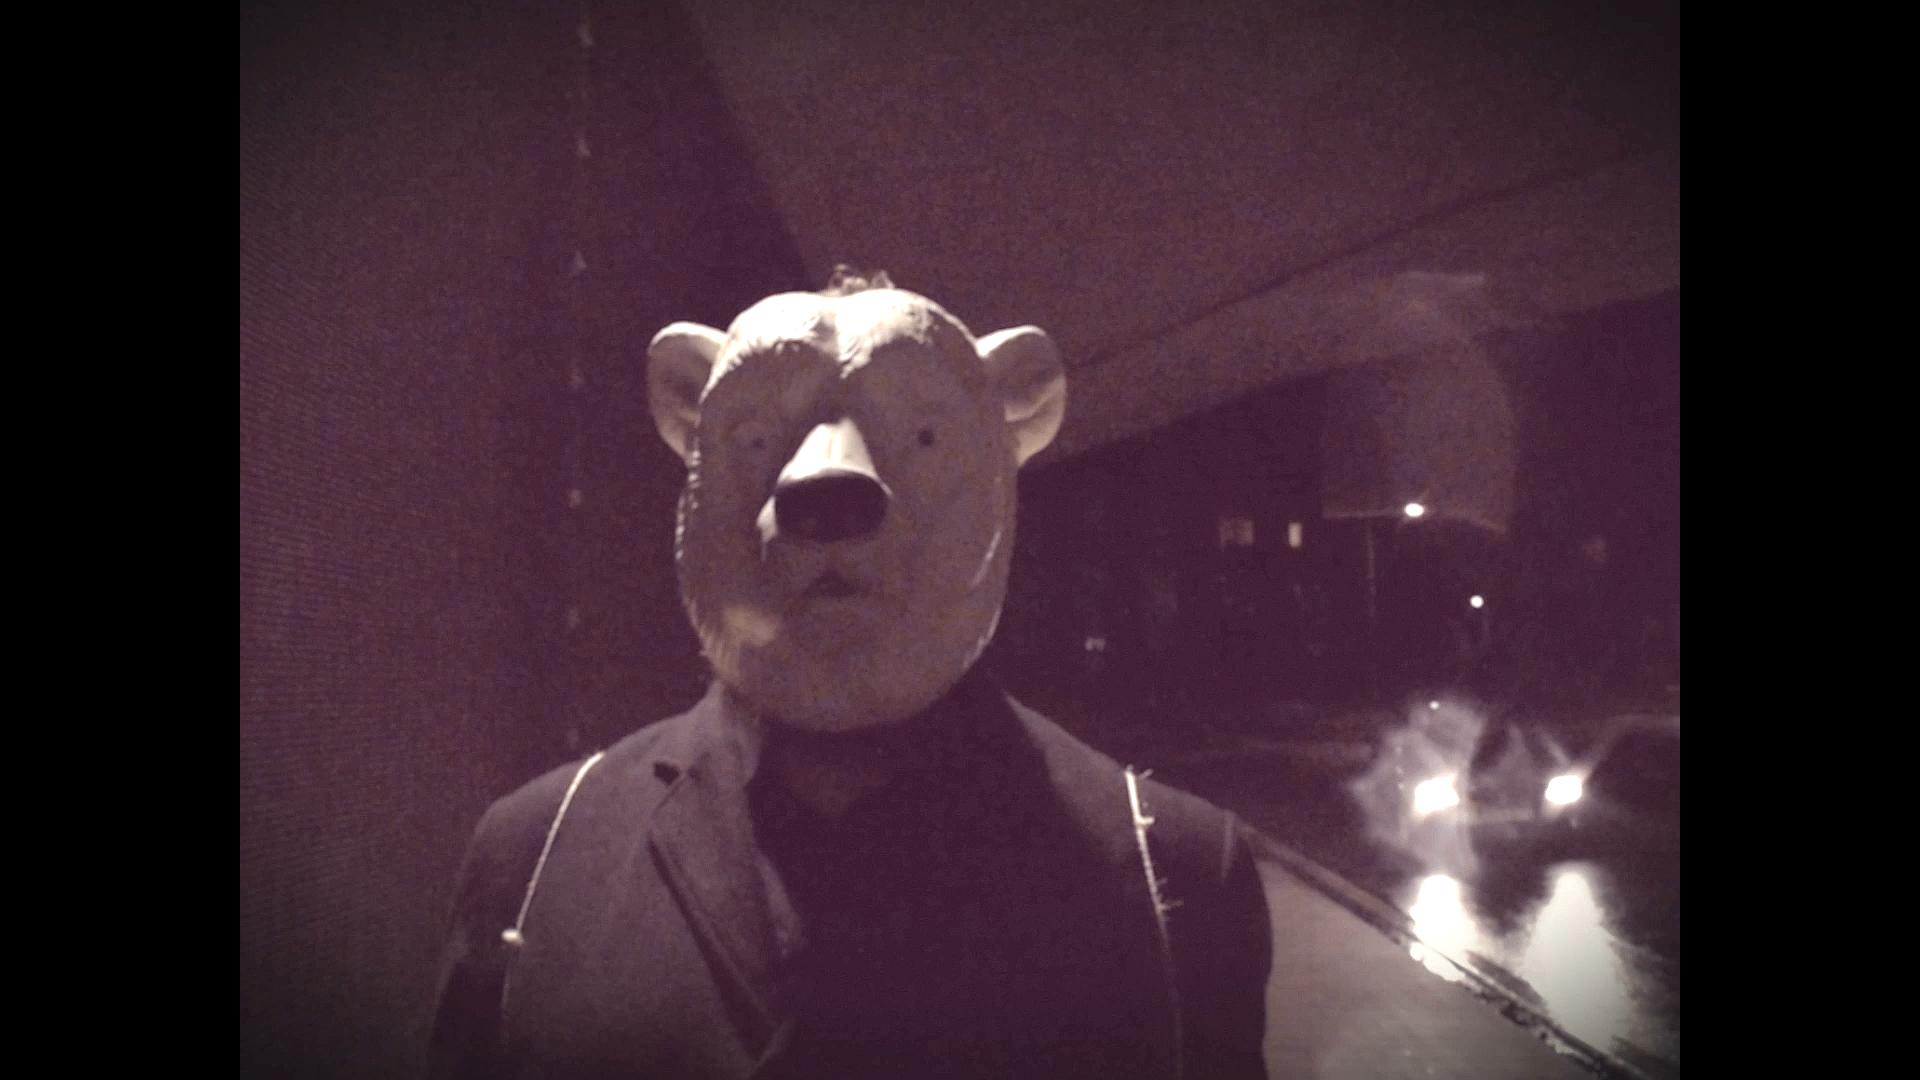 Video Snapshot with a man wearing a polar bear mask